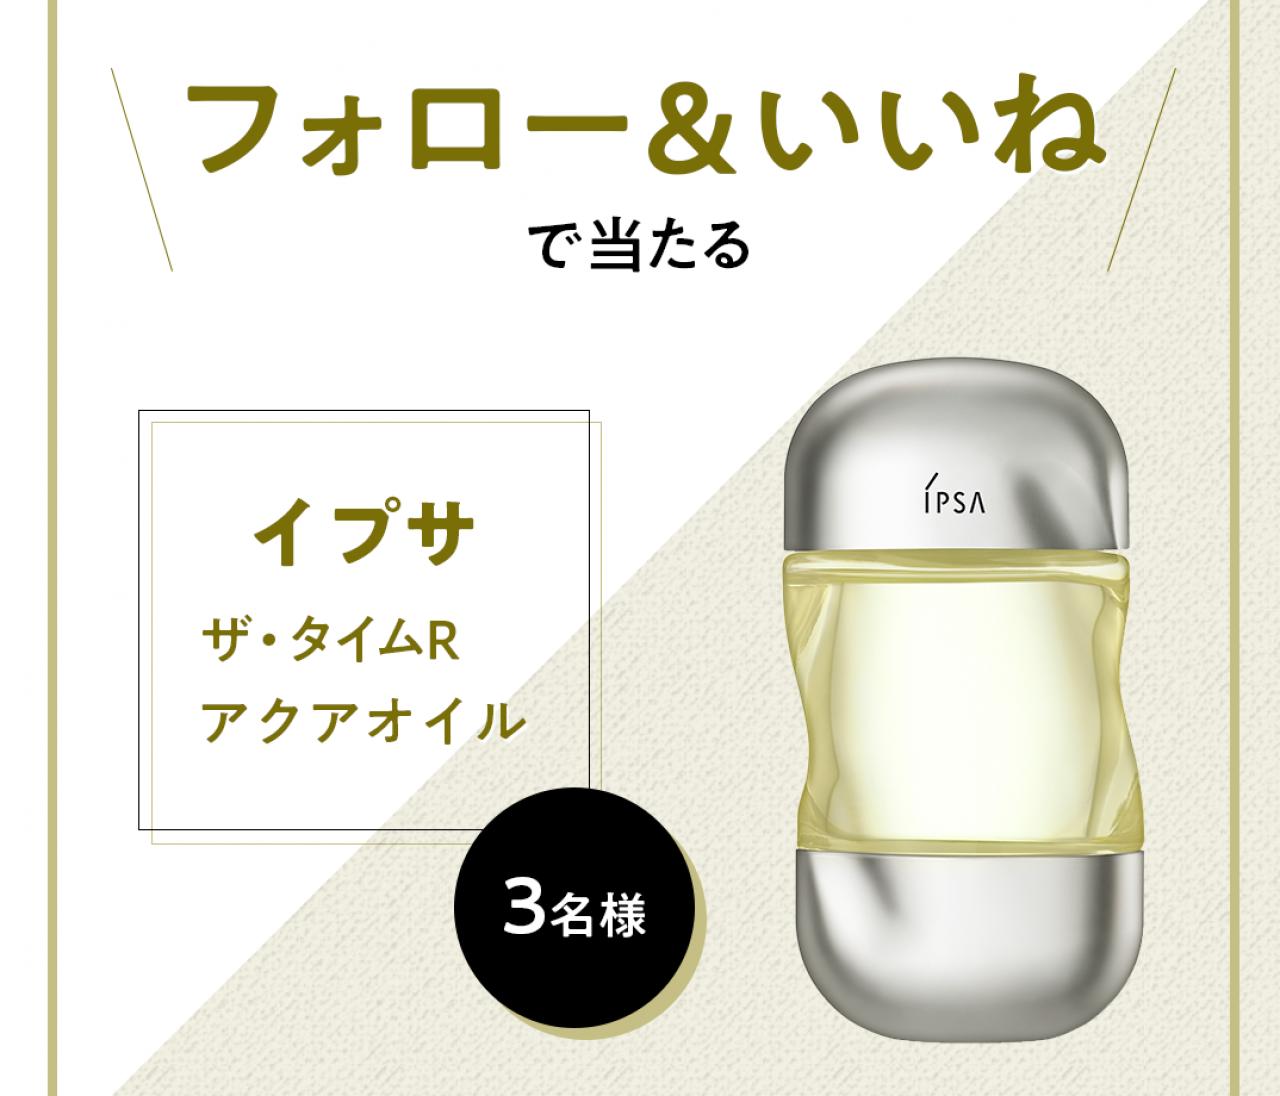 【BAILA公式Instagramフォロー&いいねキャンペーン】イプサのオイル状美容液をプレゼント!